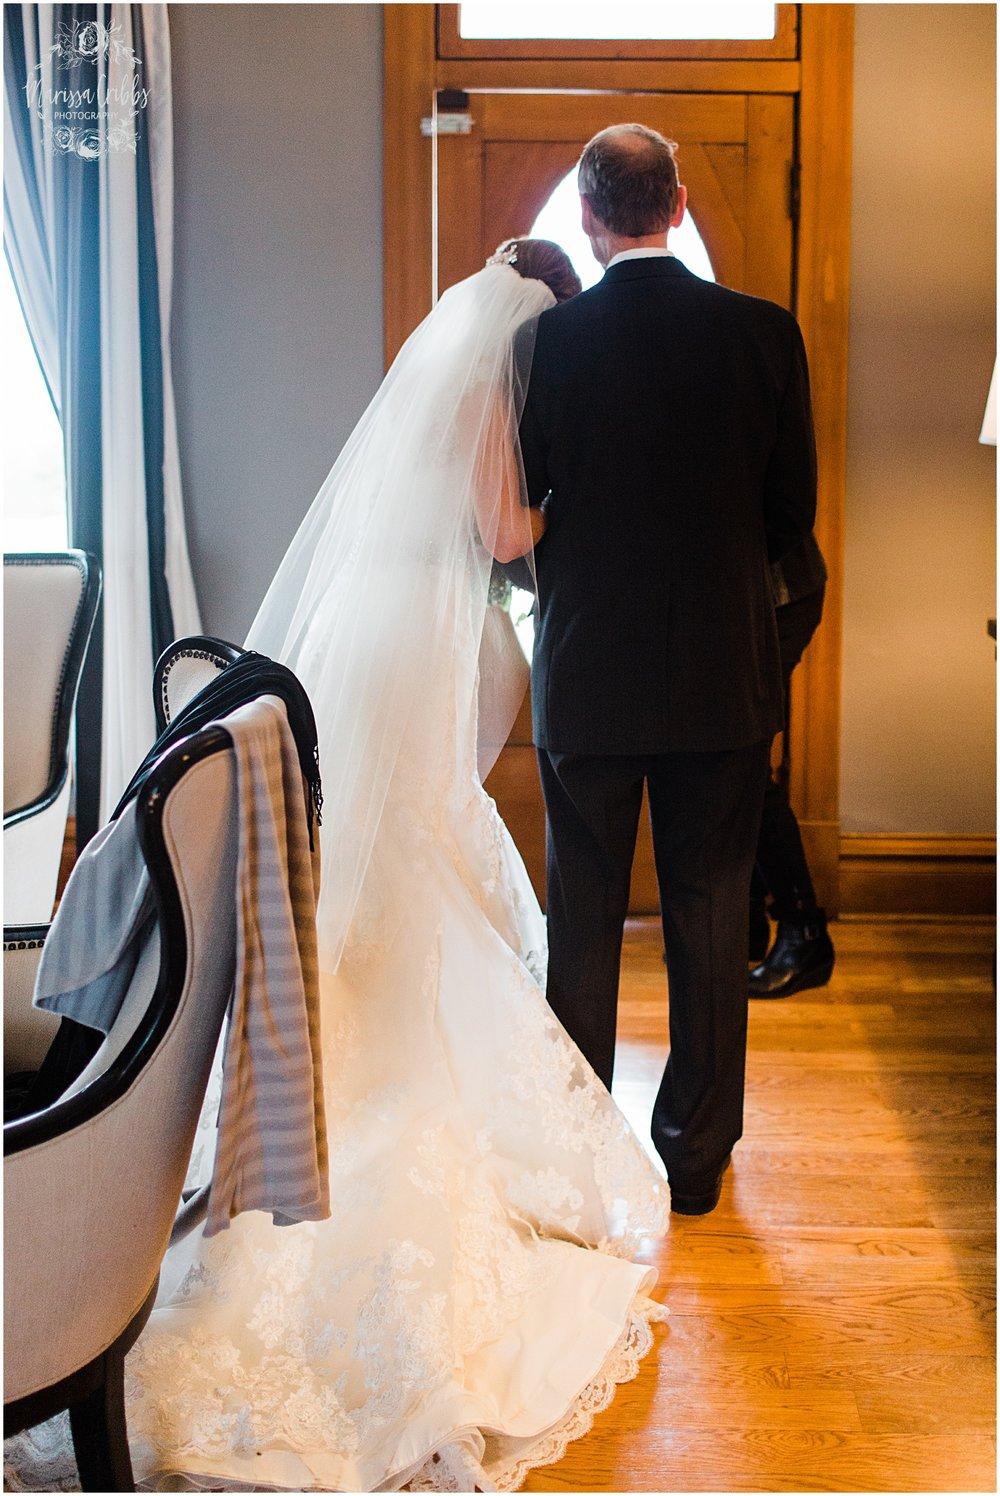 JACOBI WEDDING | 1890 EVENT SPACE | MARISSA CRIBBS PHOTOGRAPHY_4310.jpg